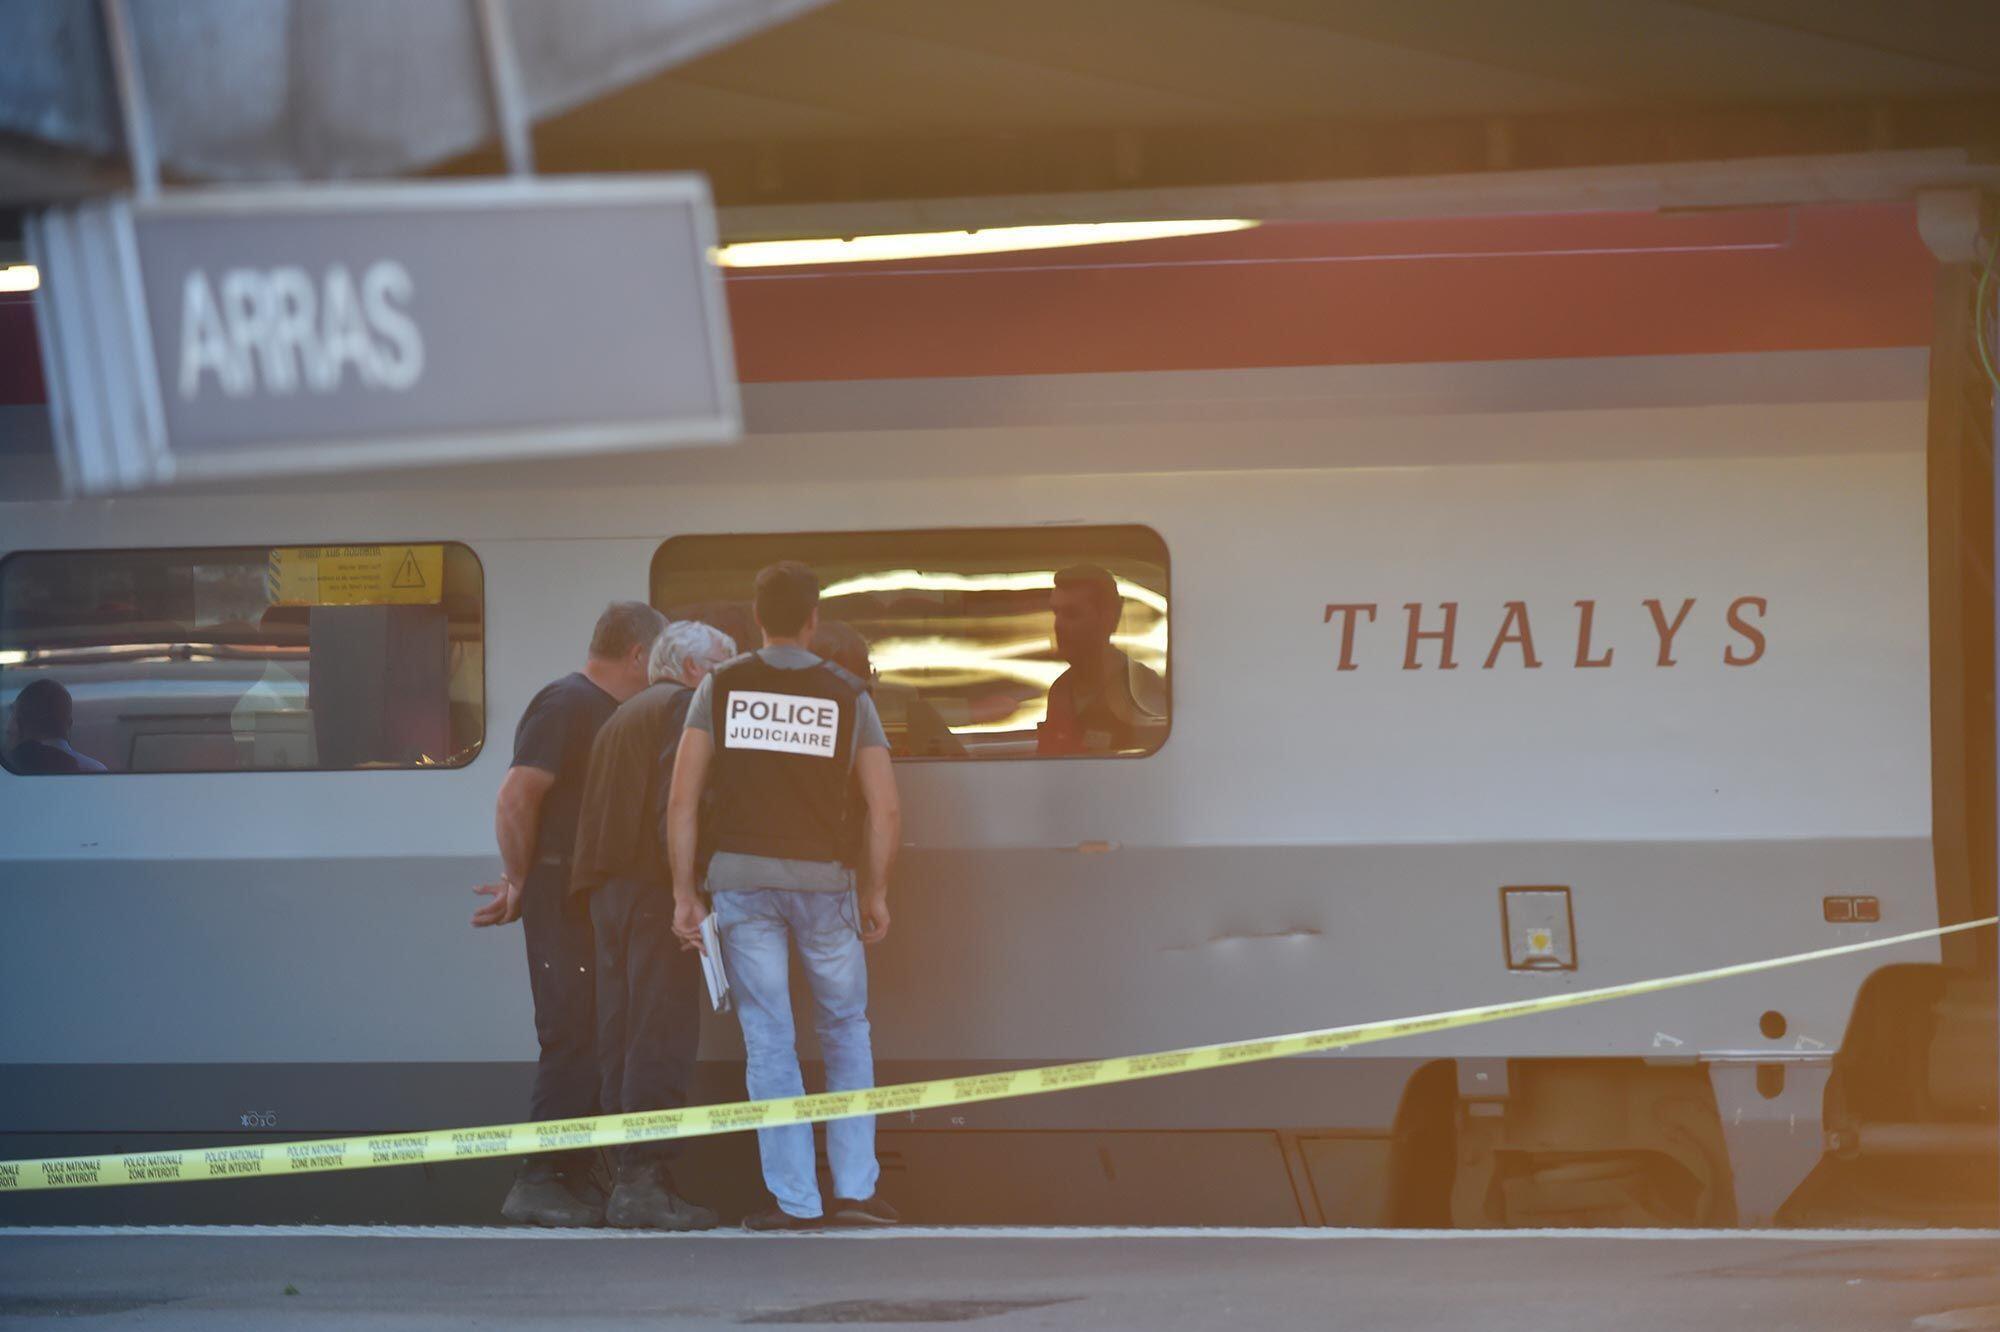 2020-16-11 france arras terrorist attack thalys train 2015